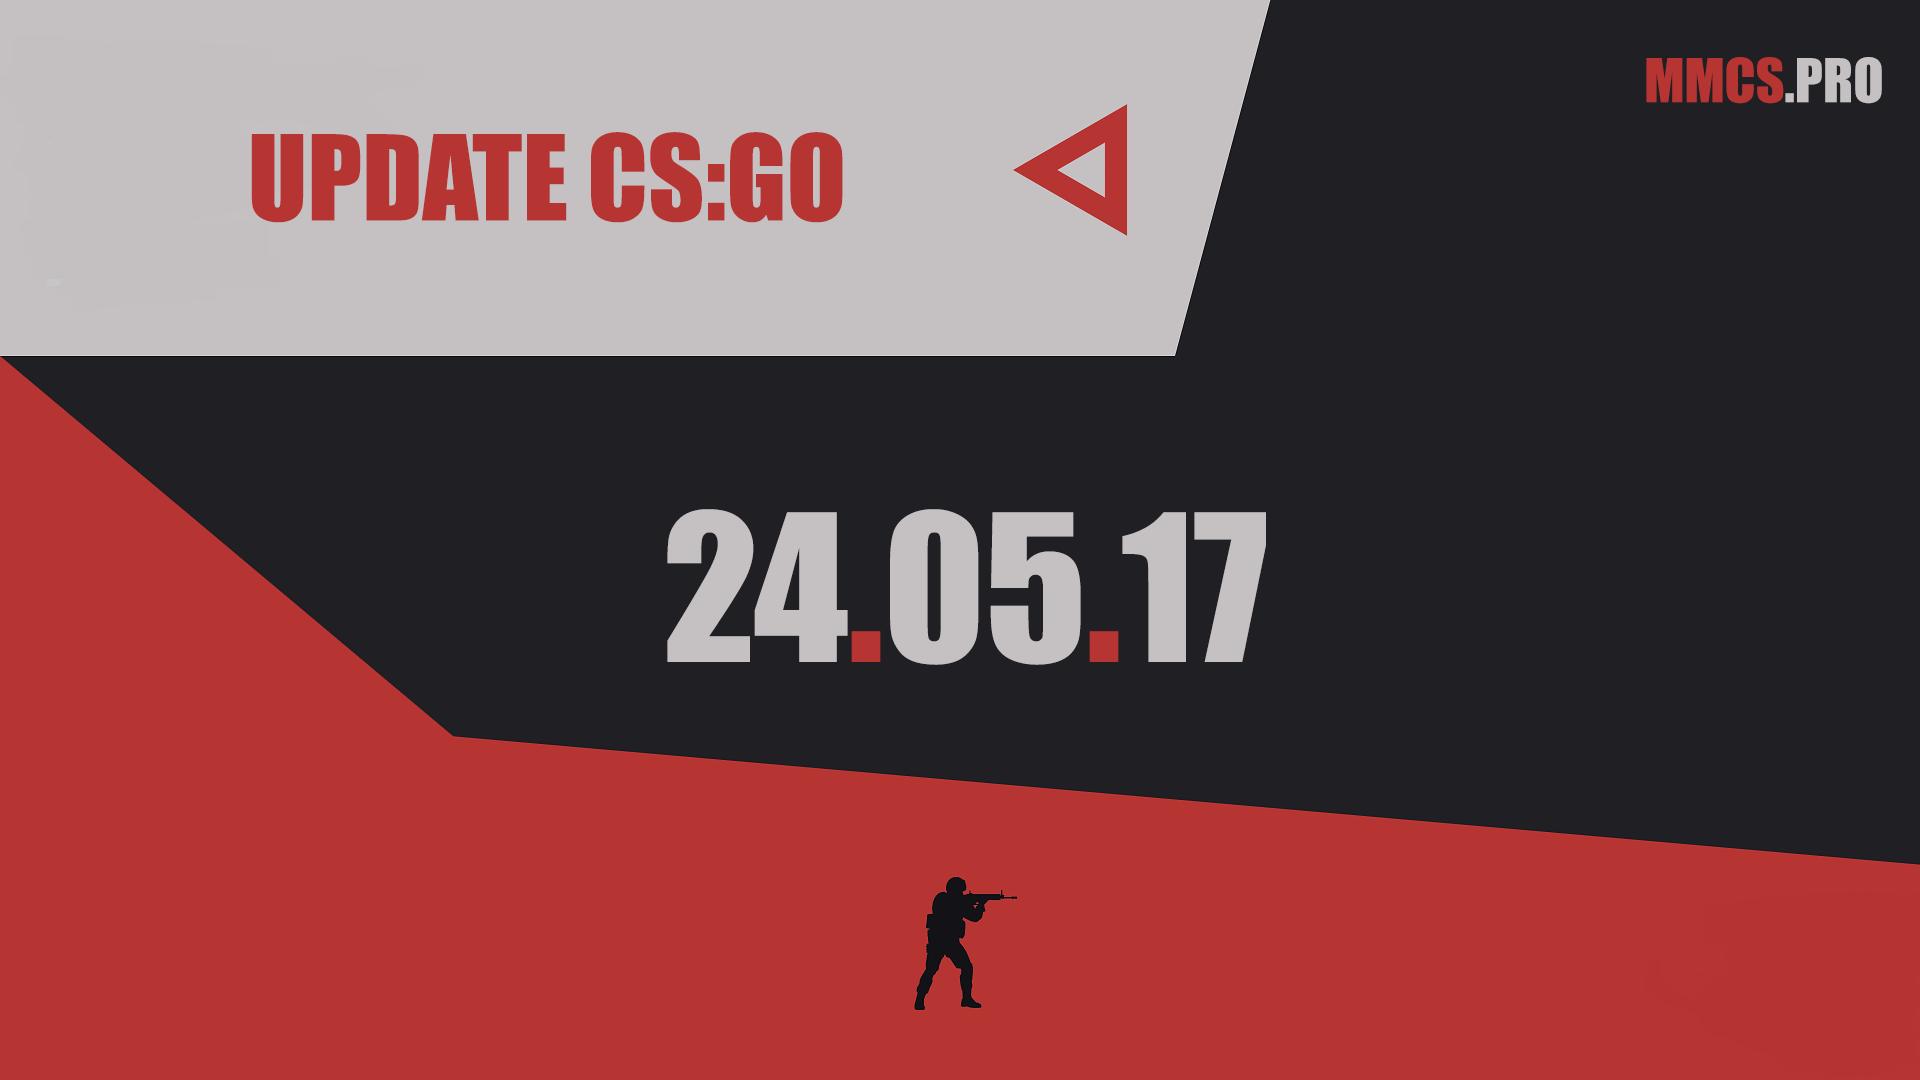 https://mmcs.pro/update-csgo-24-05-2017-valve/